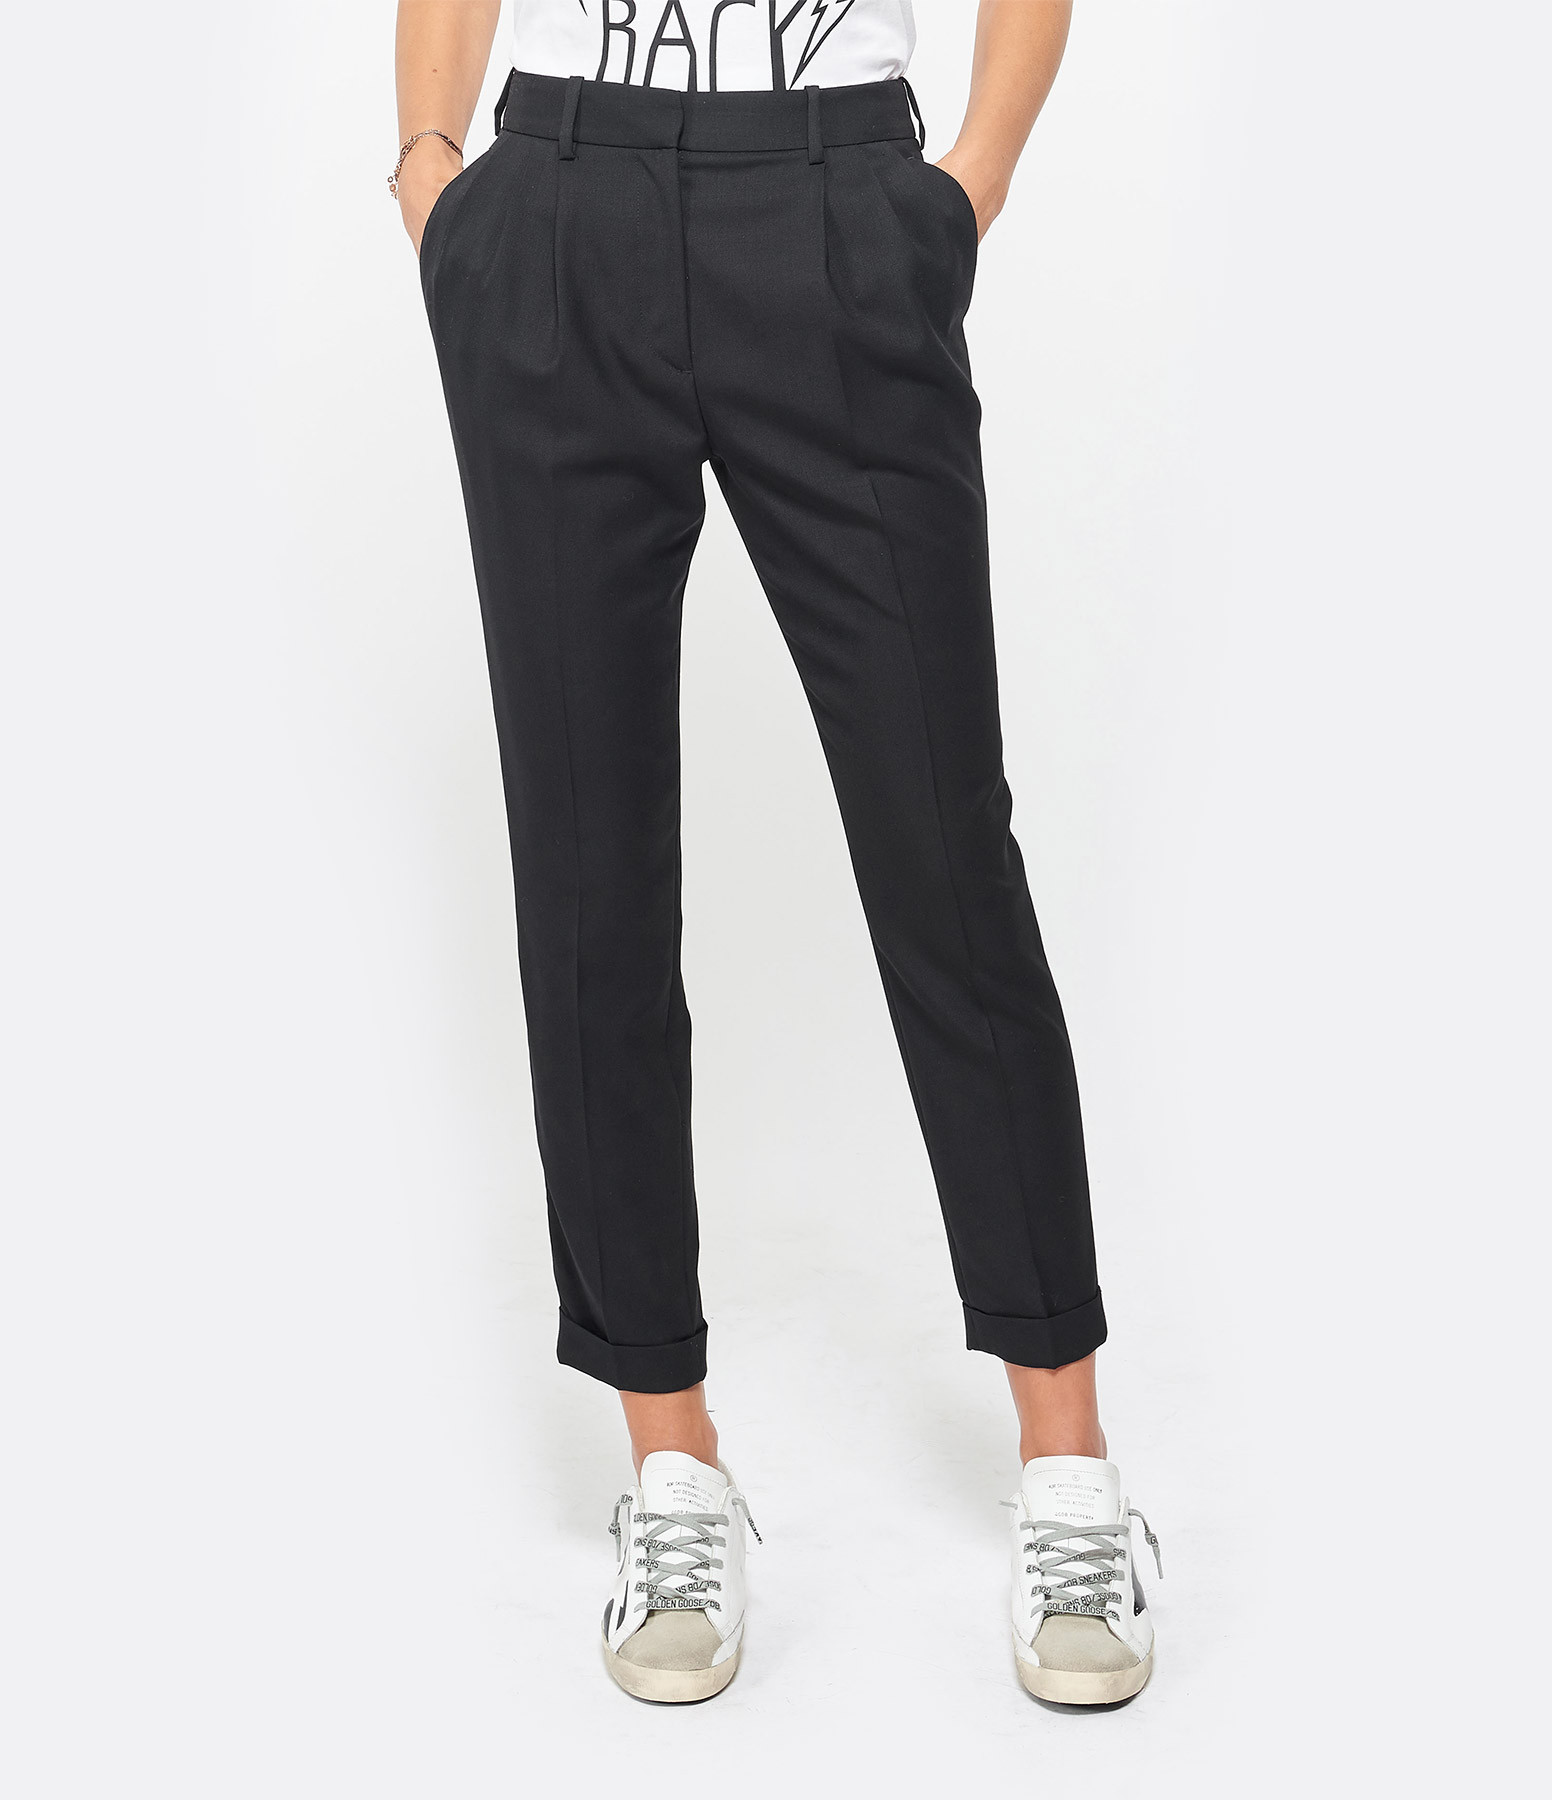 NILI LOTAN - Pantalon Montana Noir